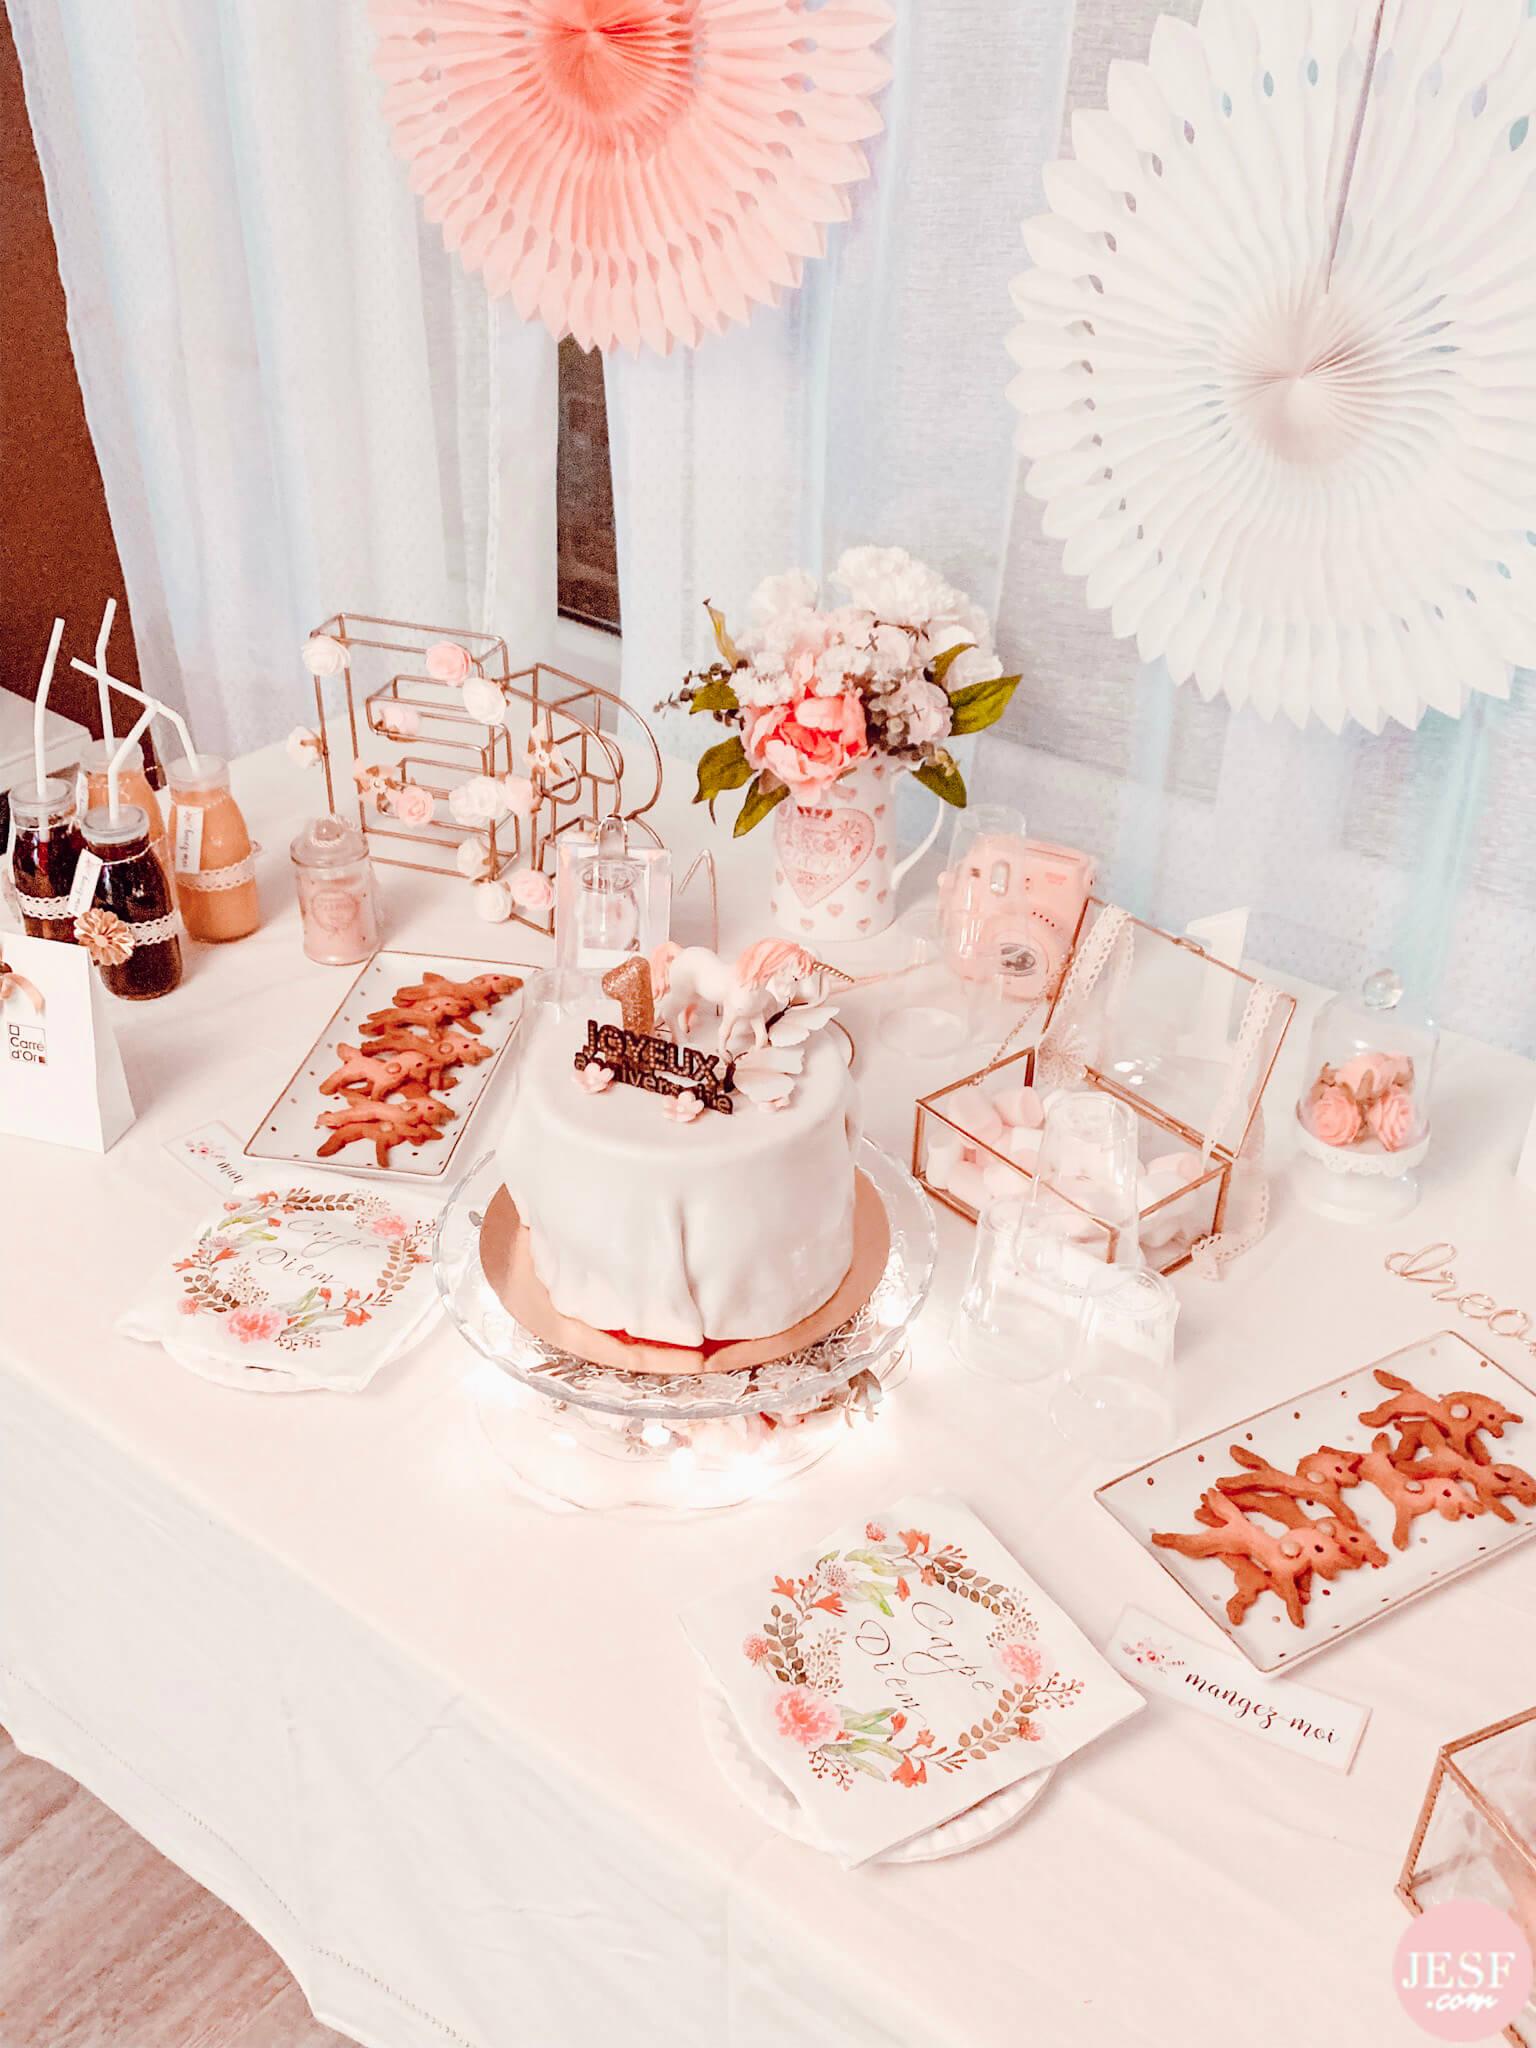 fête-anniversaire-sweet-table-petite-fille-1-an-girly-rose-idées-déco